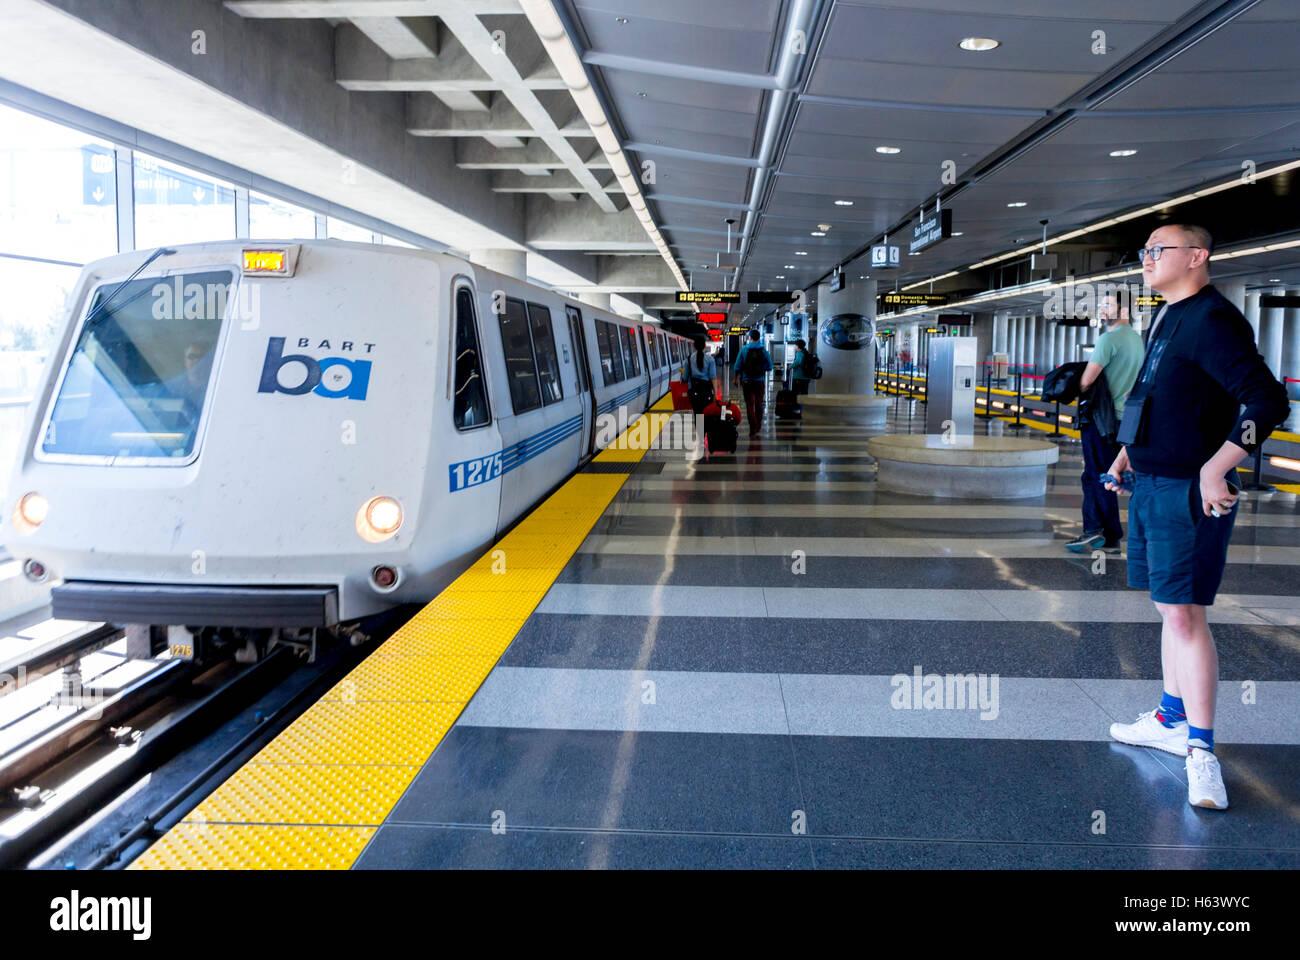 San Francisco, CA, USA, Chinese Man standing alone in empty train BART Subway Metro Station Platform at Airport - Stock Image